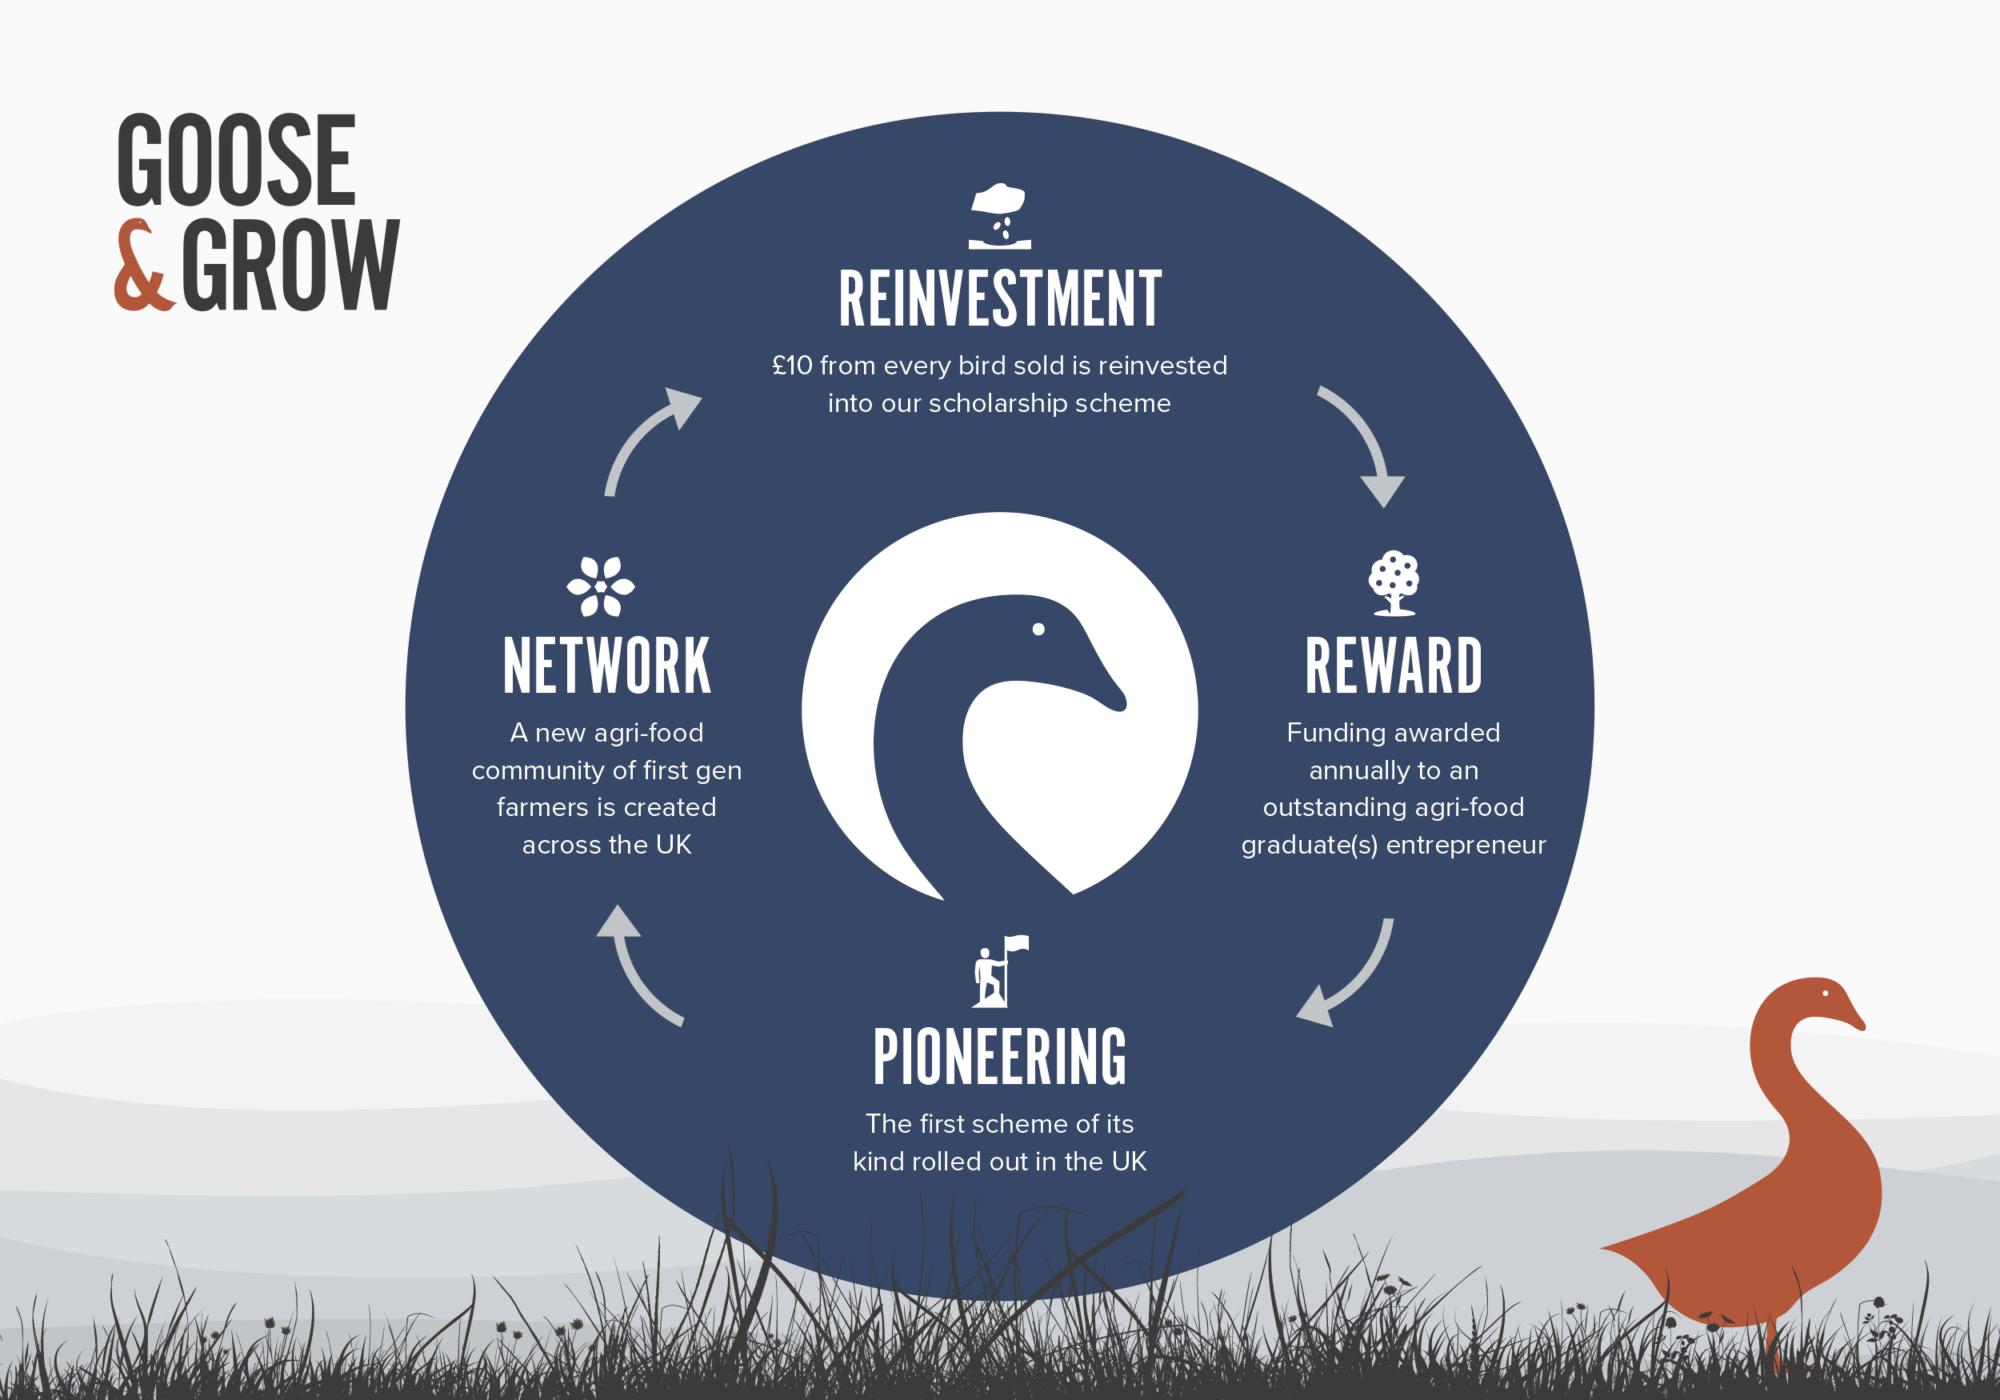 Goose & Co - Branding, Web Design, Digital Marketing & Social